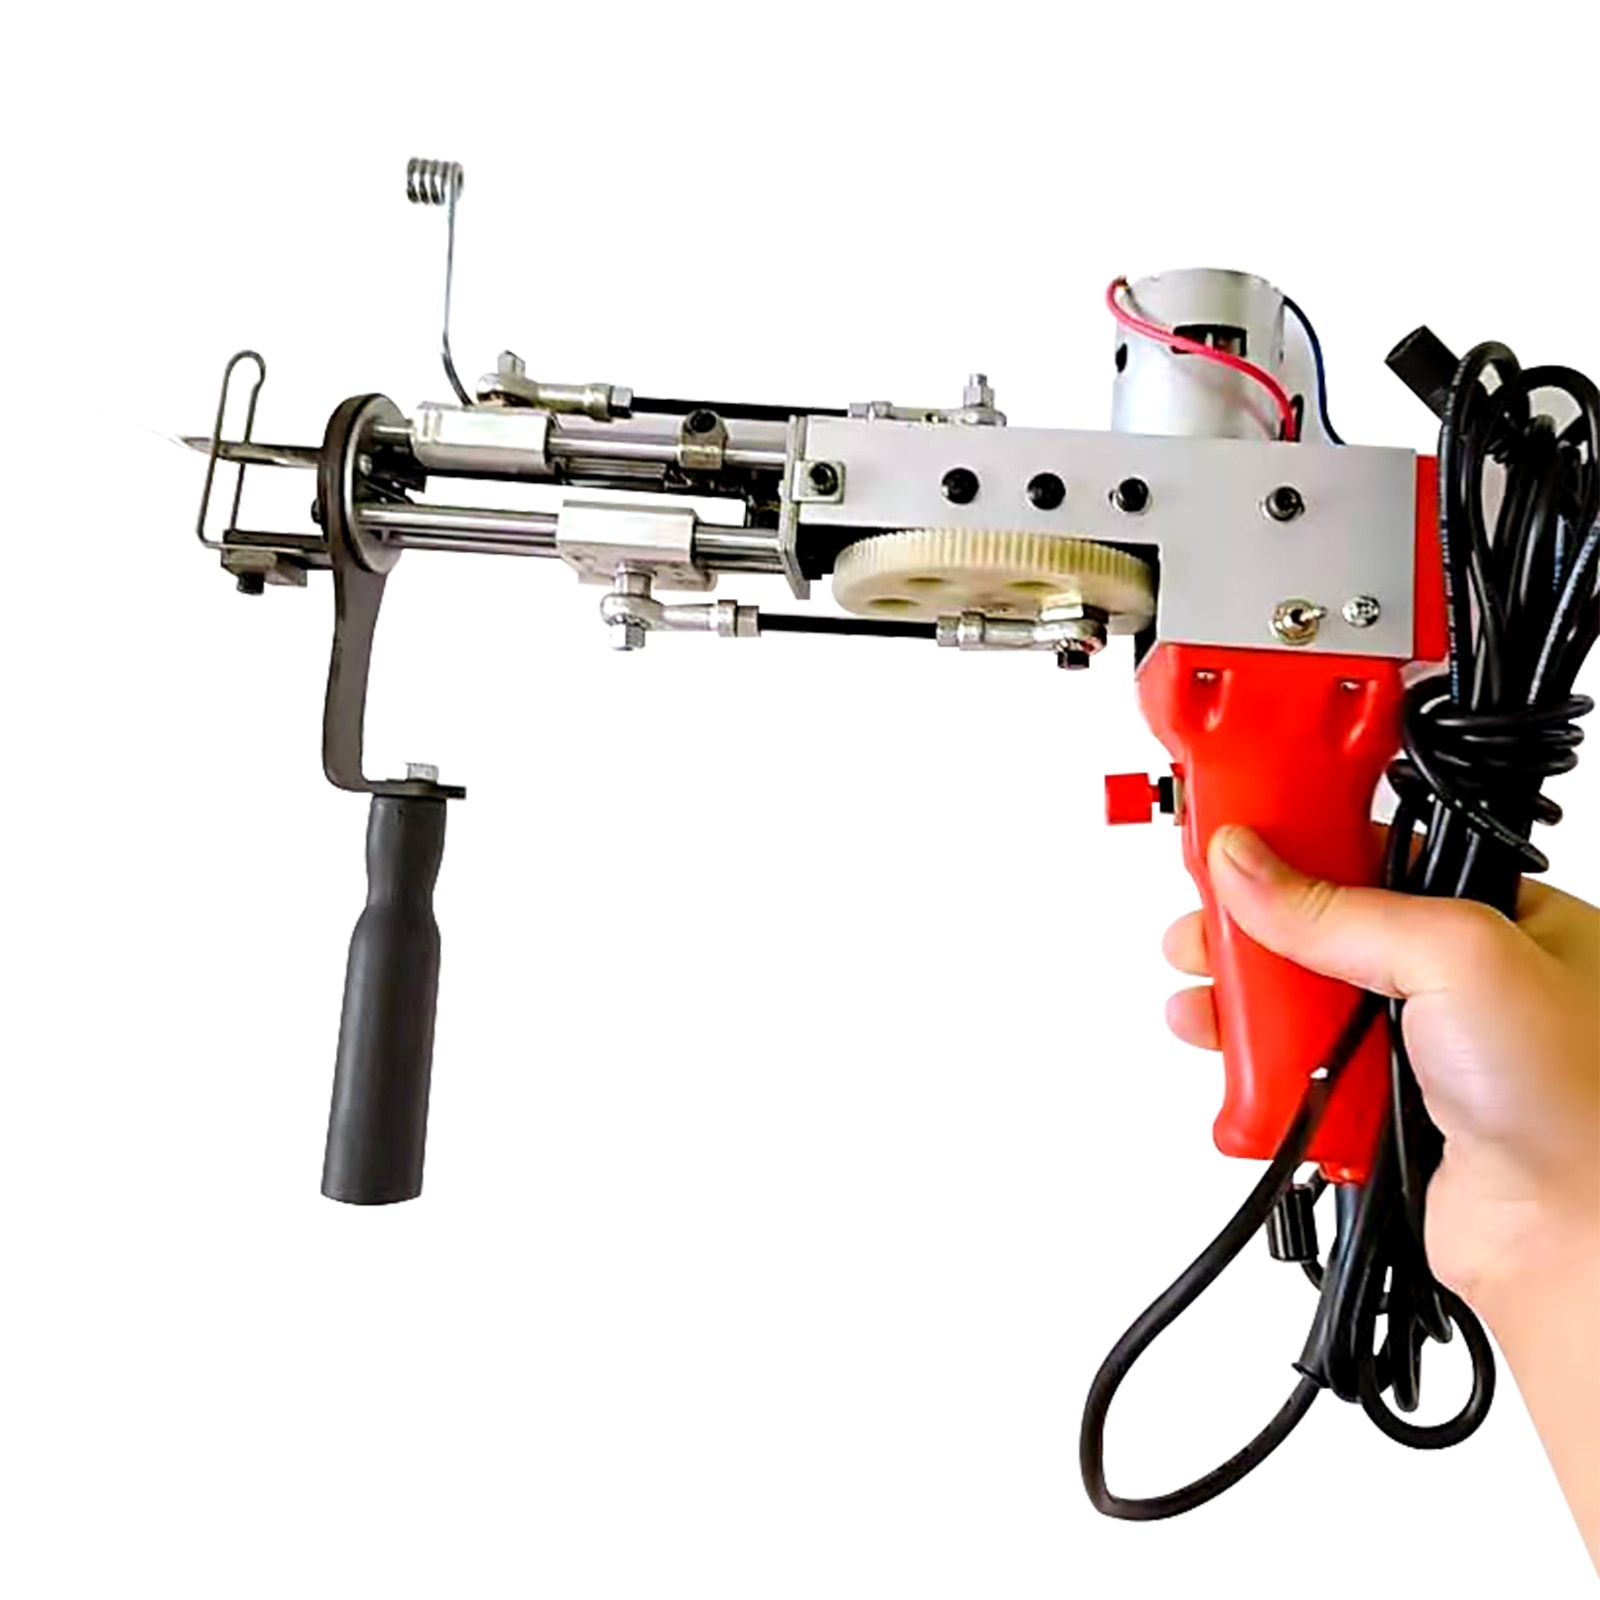 Red Electric Carpet Tufting Gun Carpet Loom Flocking Machine Industrial Embroidery Machine, Cut Pile Knitting Machine 110V enlarge